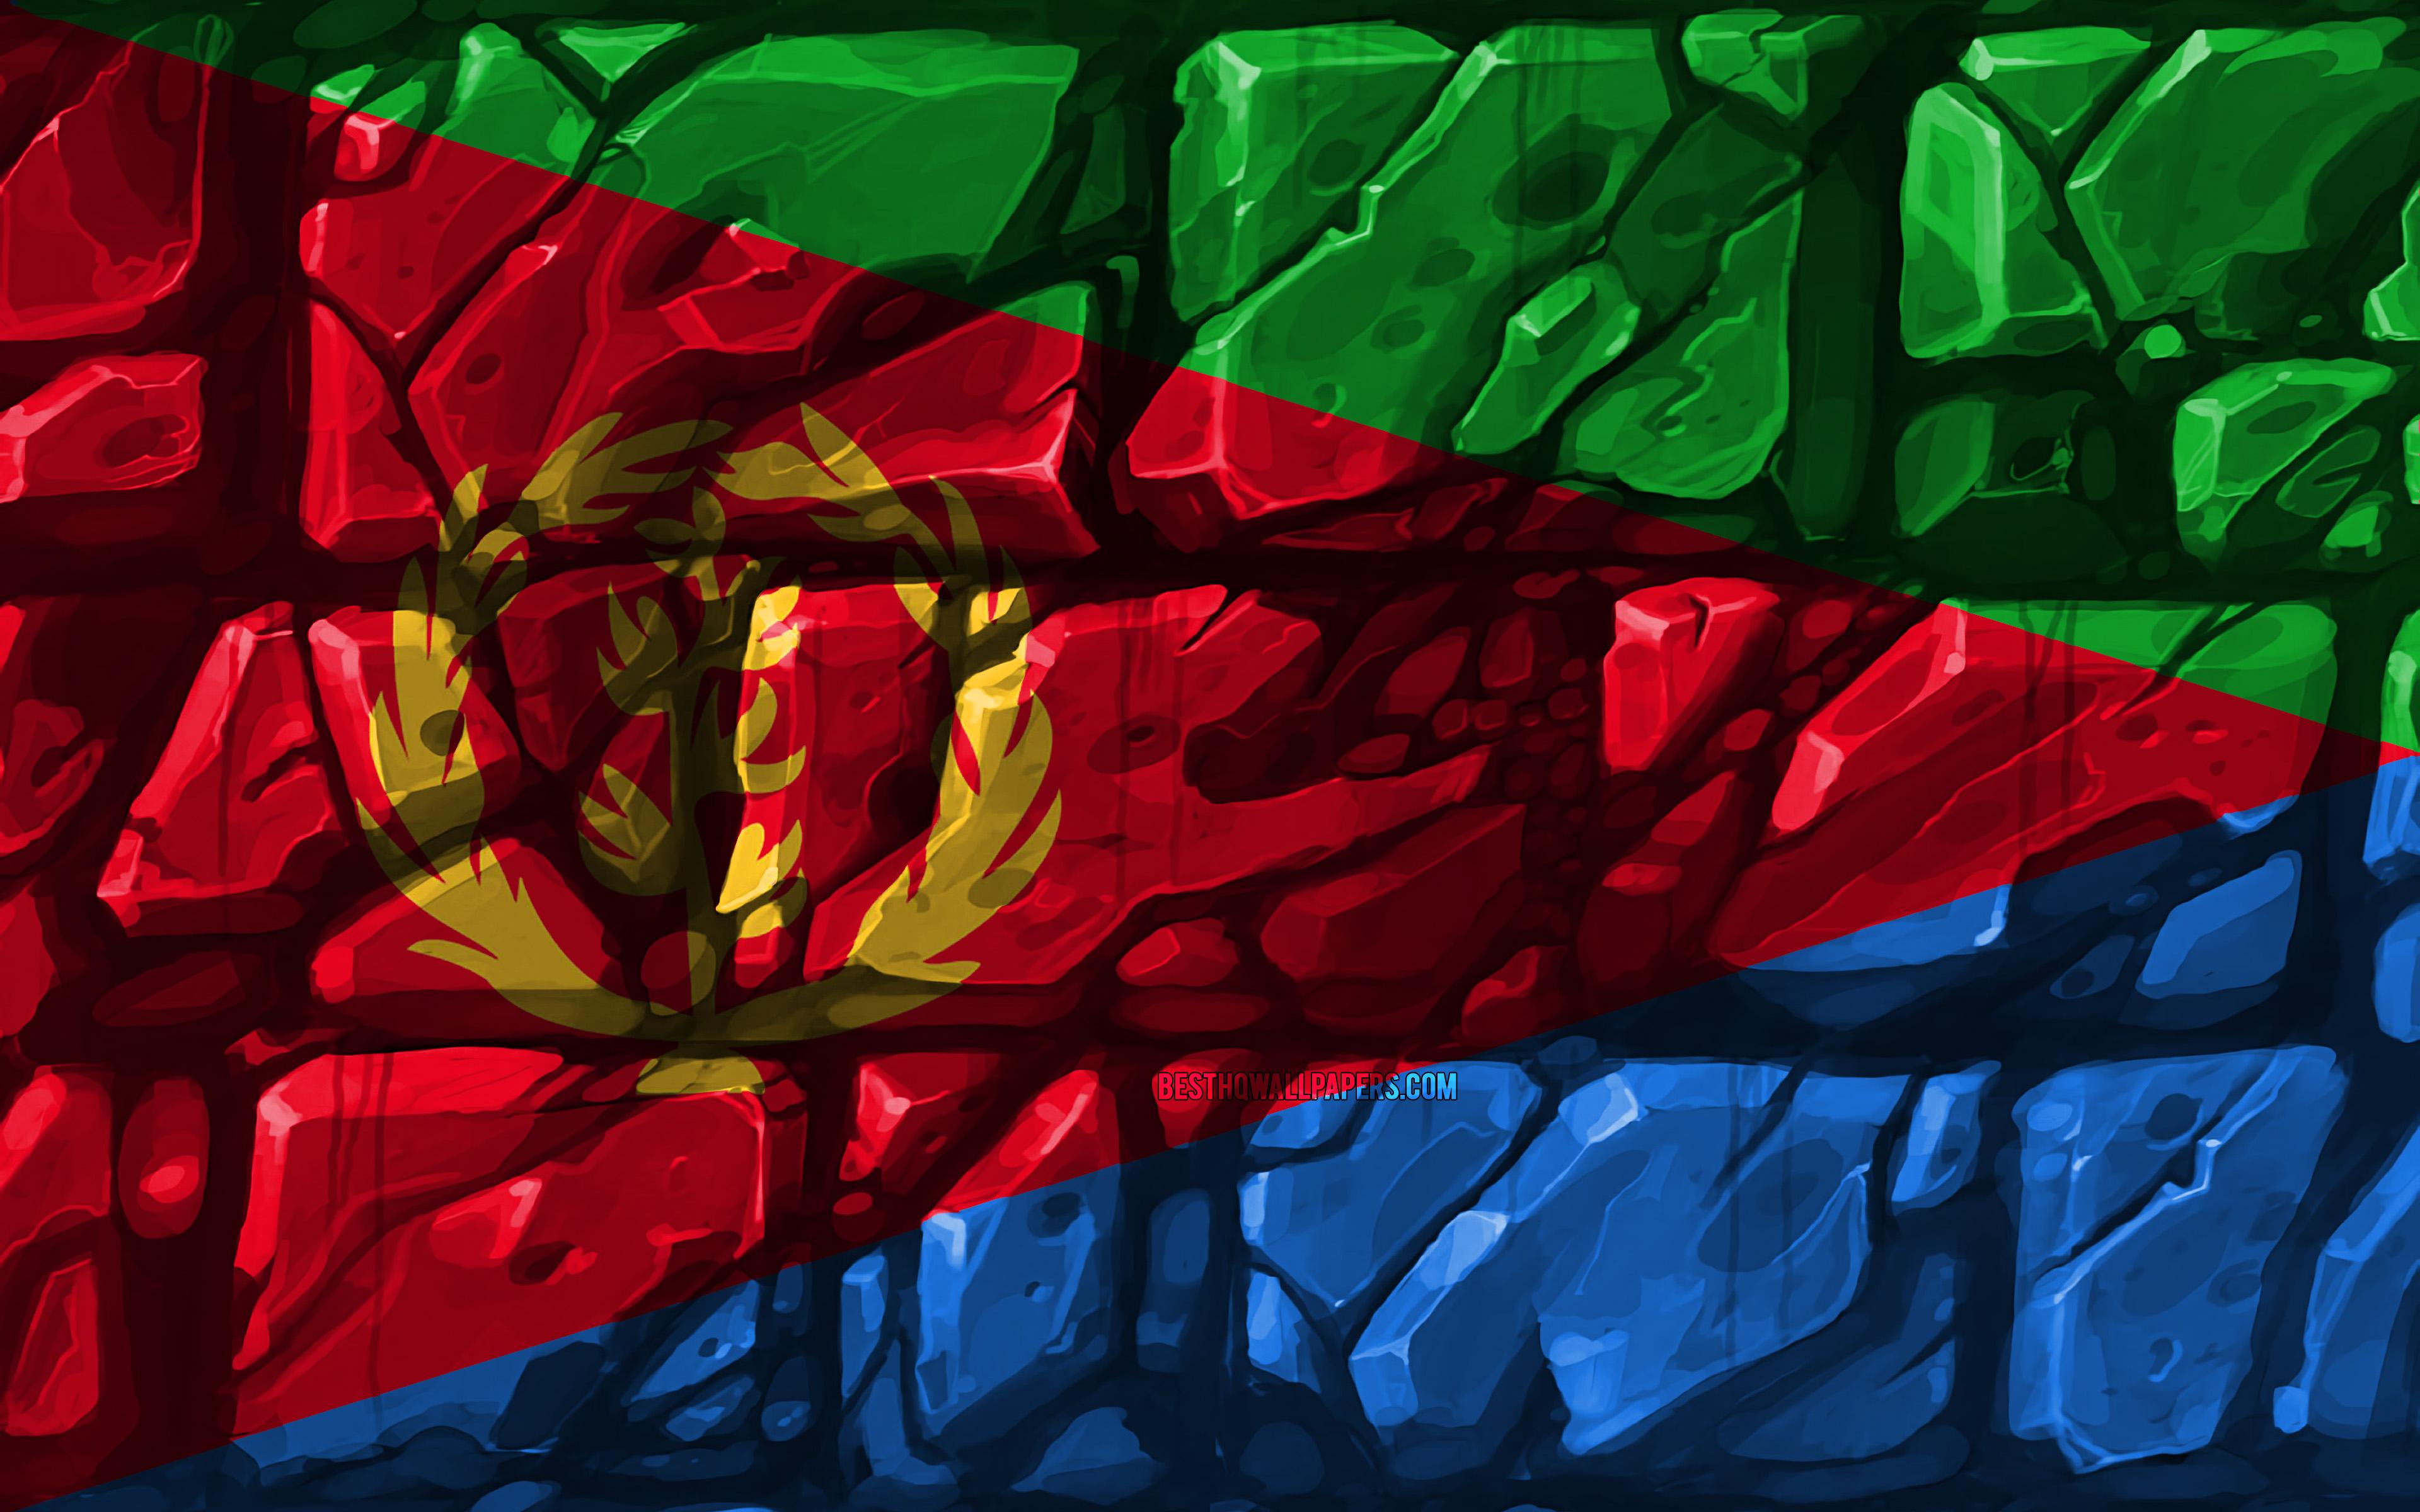 Download wallpapers Eritrean flag brickwall 4k African 3840x2400